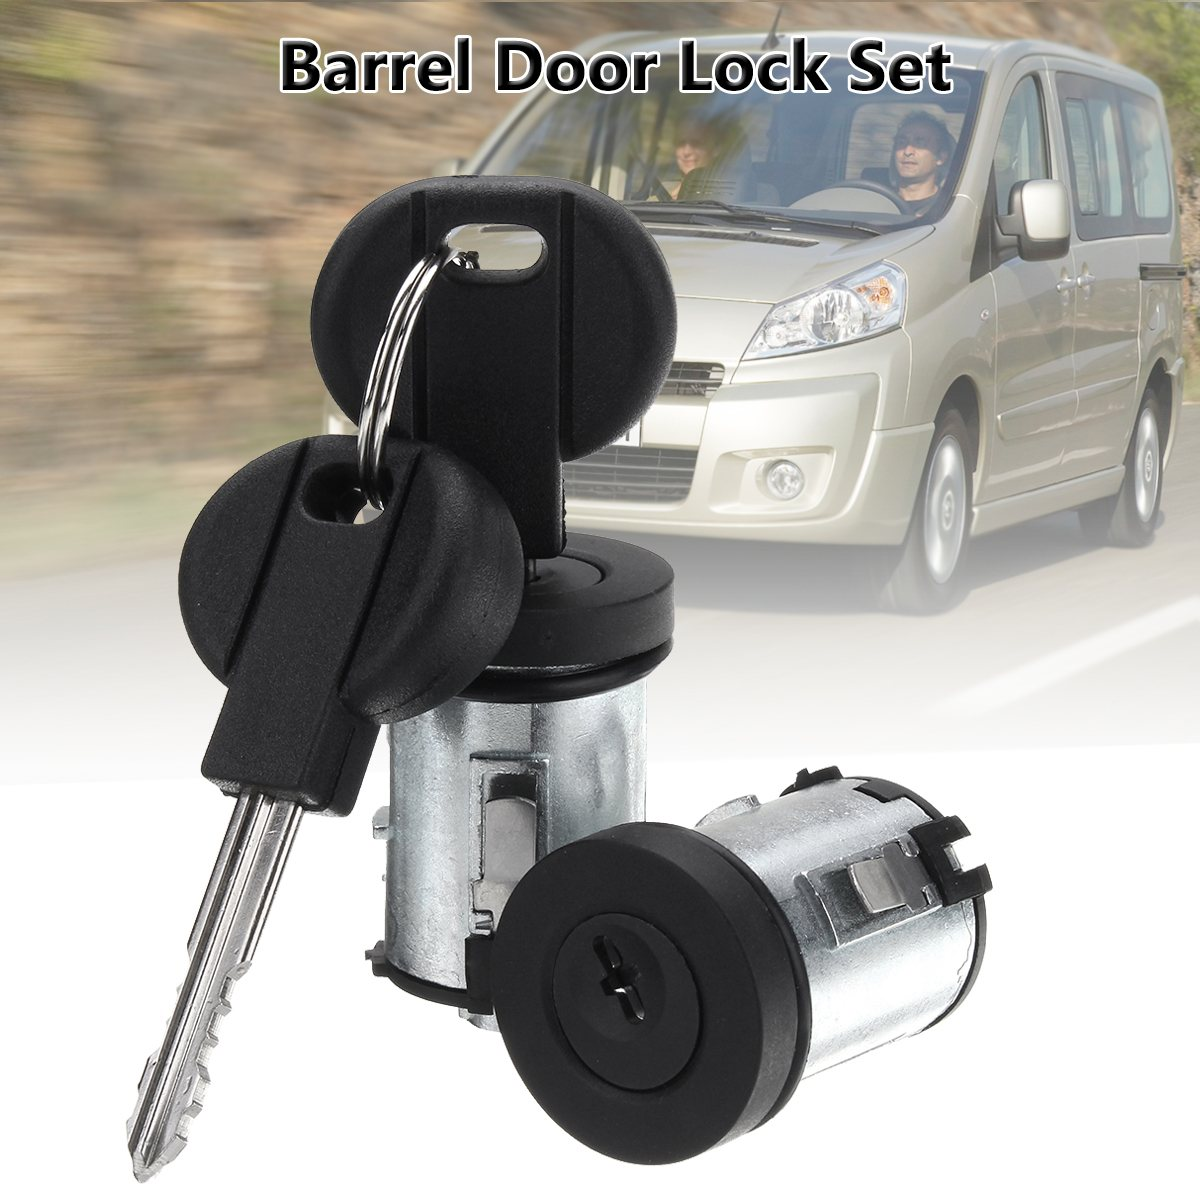 FUSION DOOR LOCK SET WITH KEYS IGNITION BARREL /& BOOT GENUINE FORD FIESTA MK5